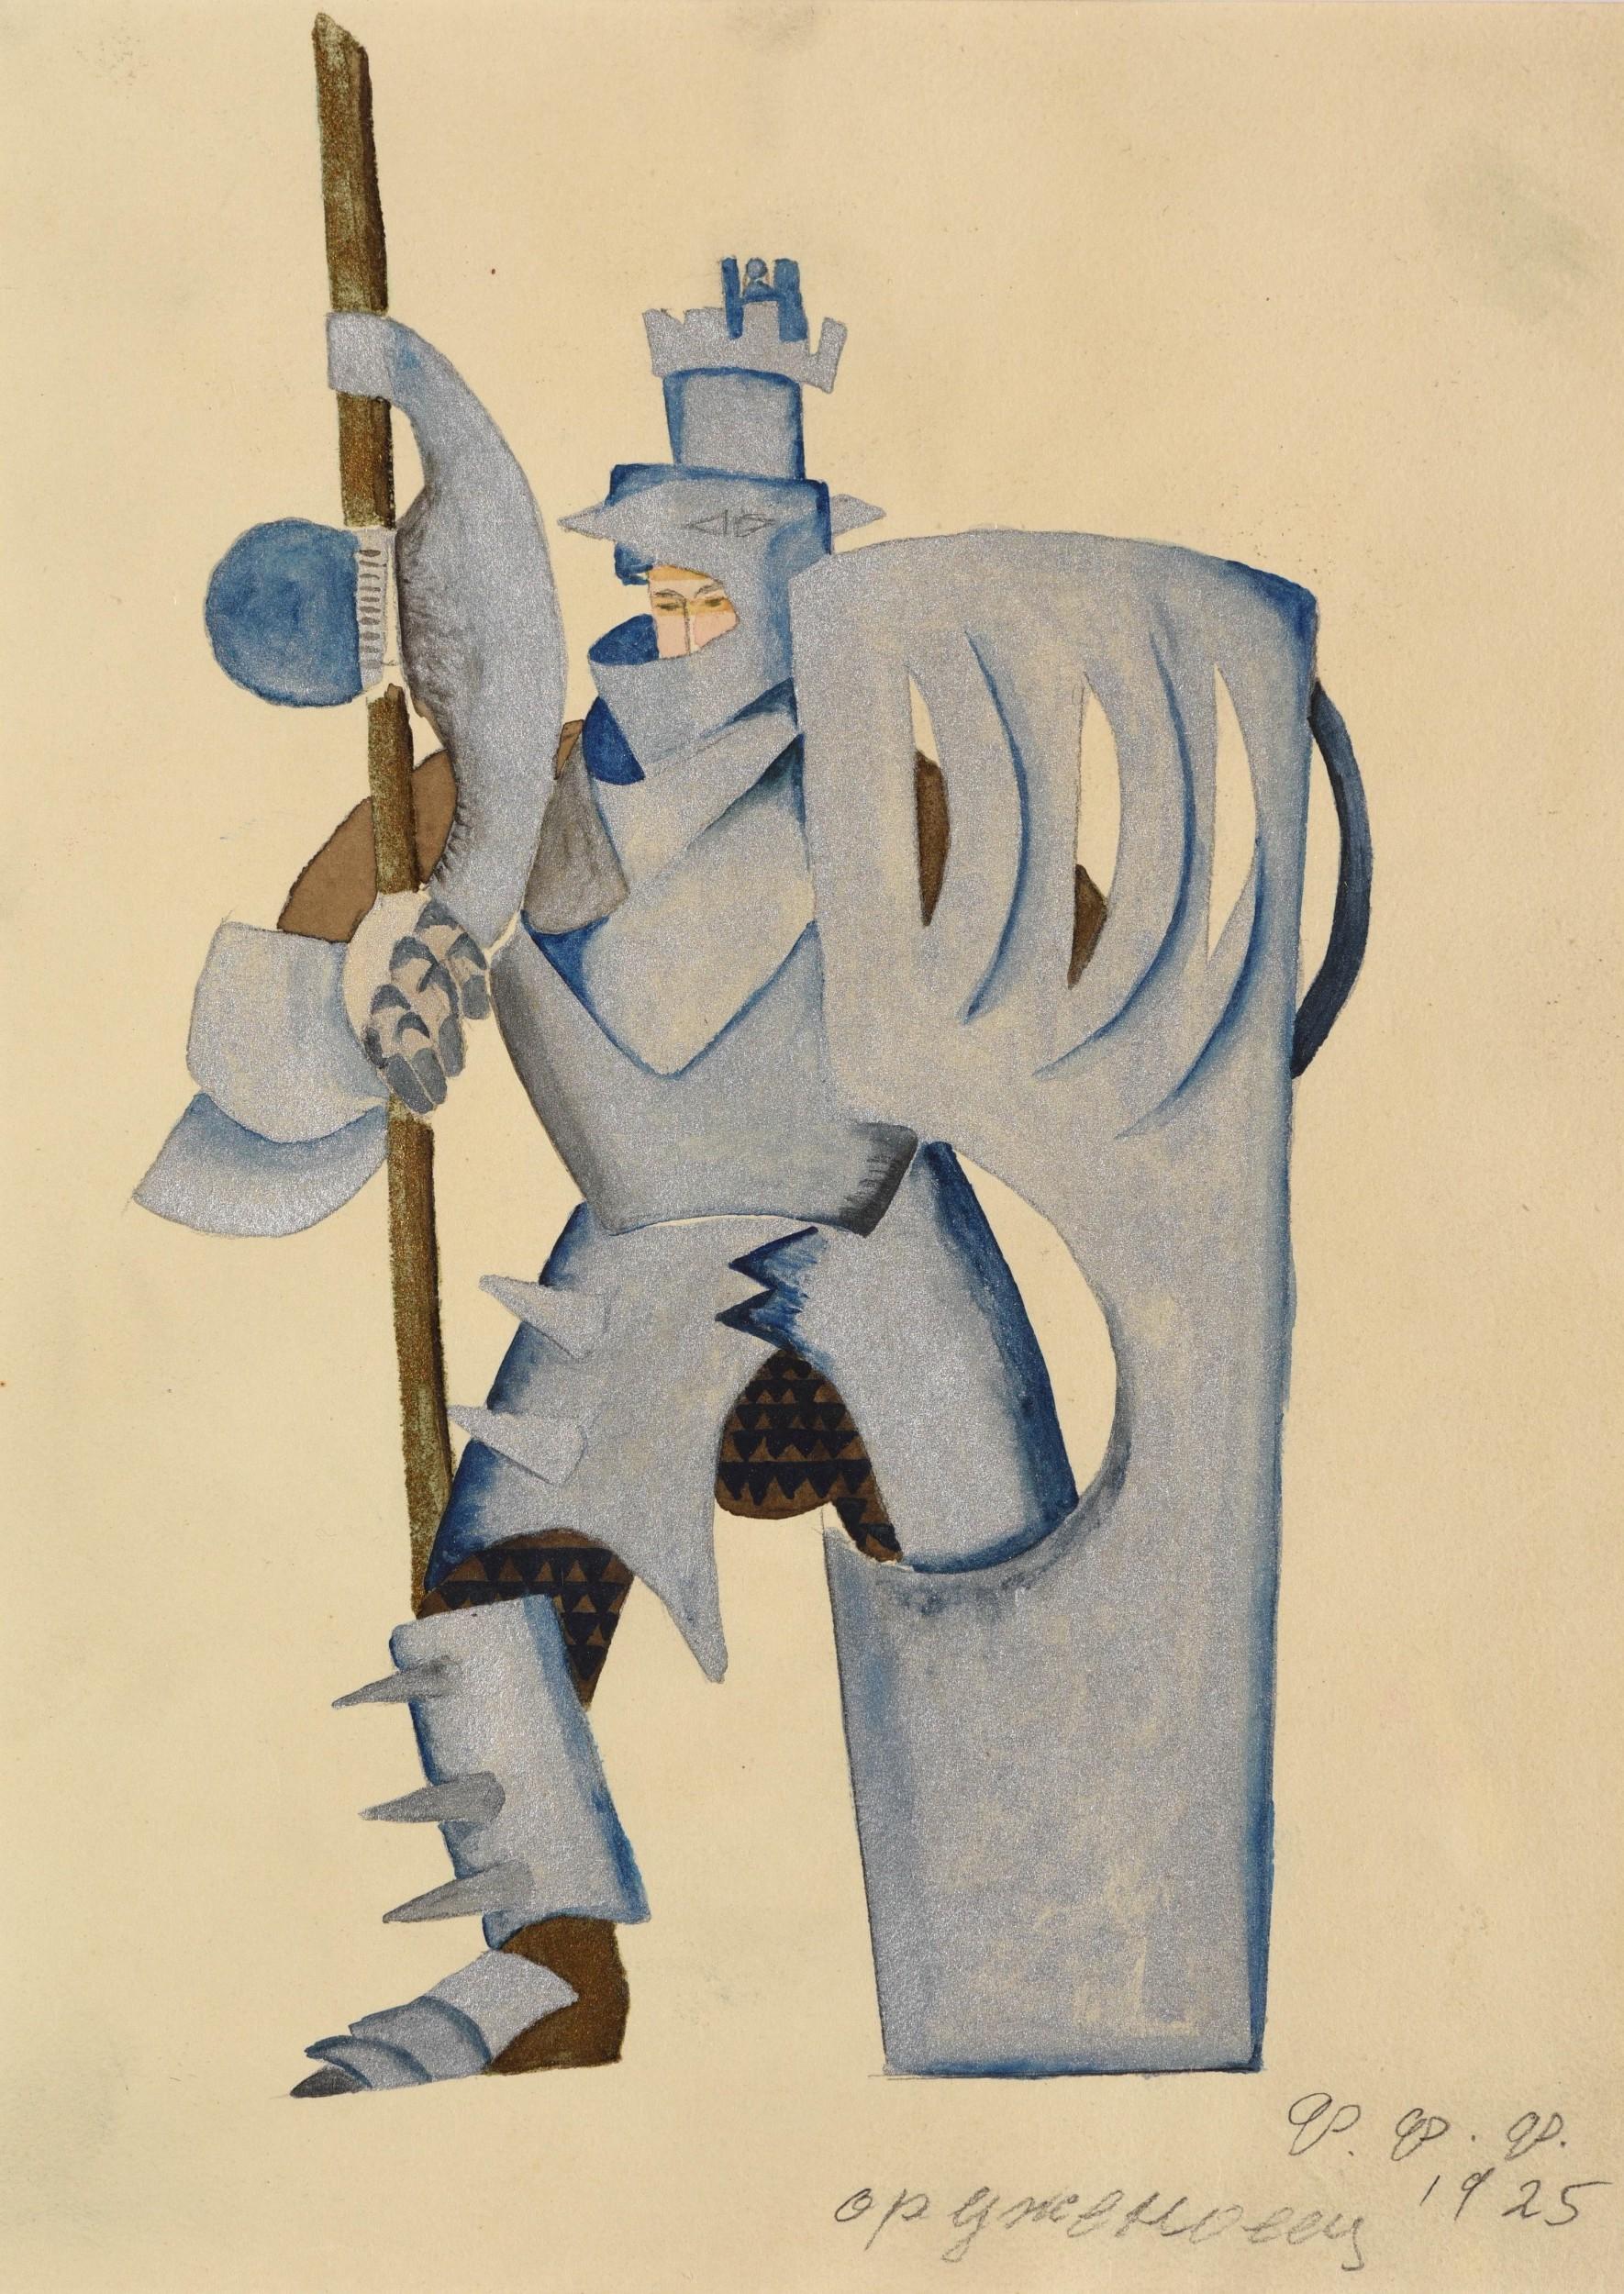 Feodor Feodorovich Fedorovski, Sketch for a Costume of 'Lohengrin', 1925. Photo: © HVMC